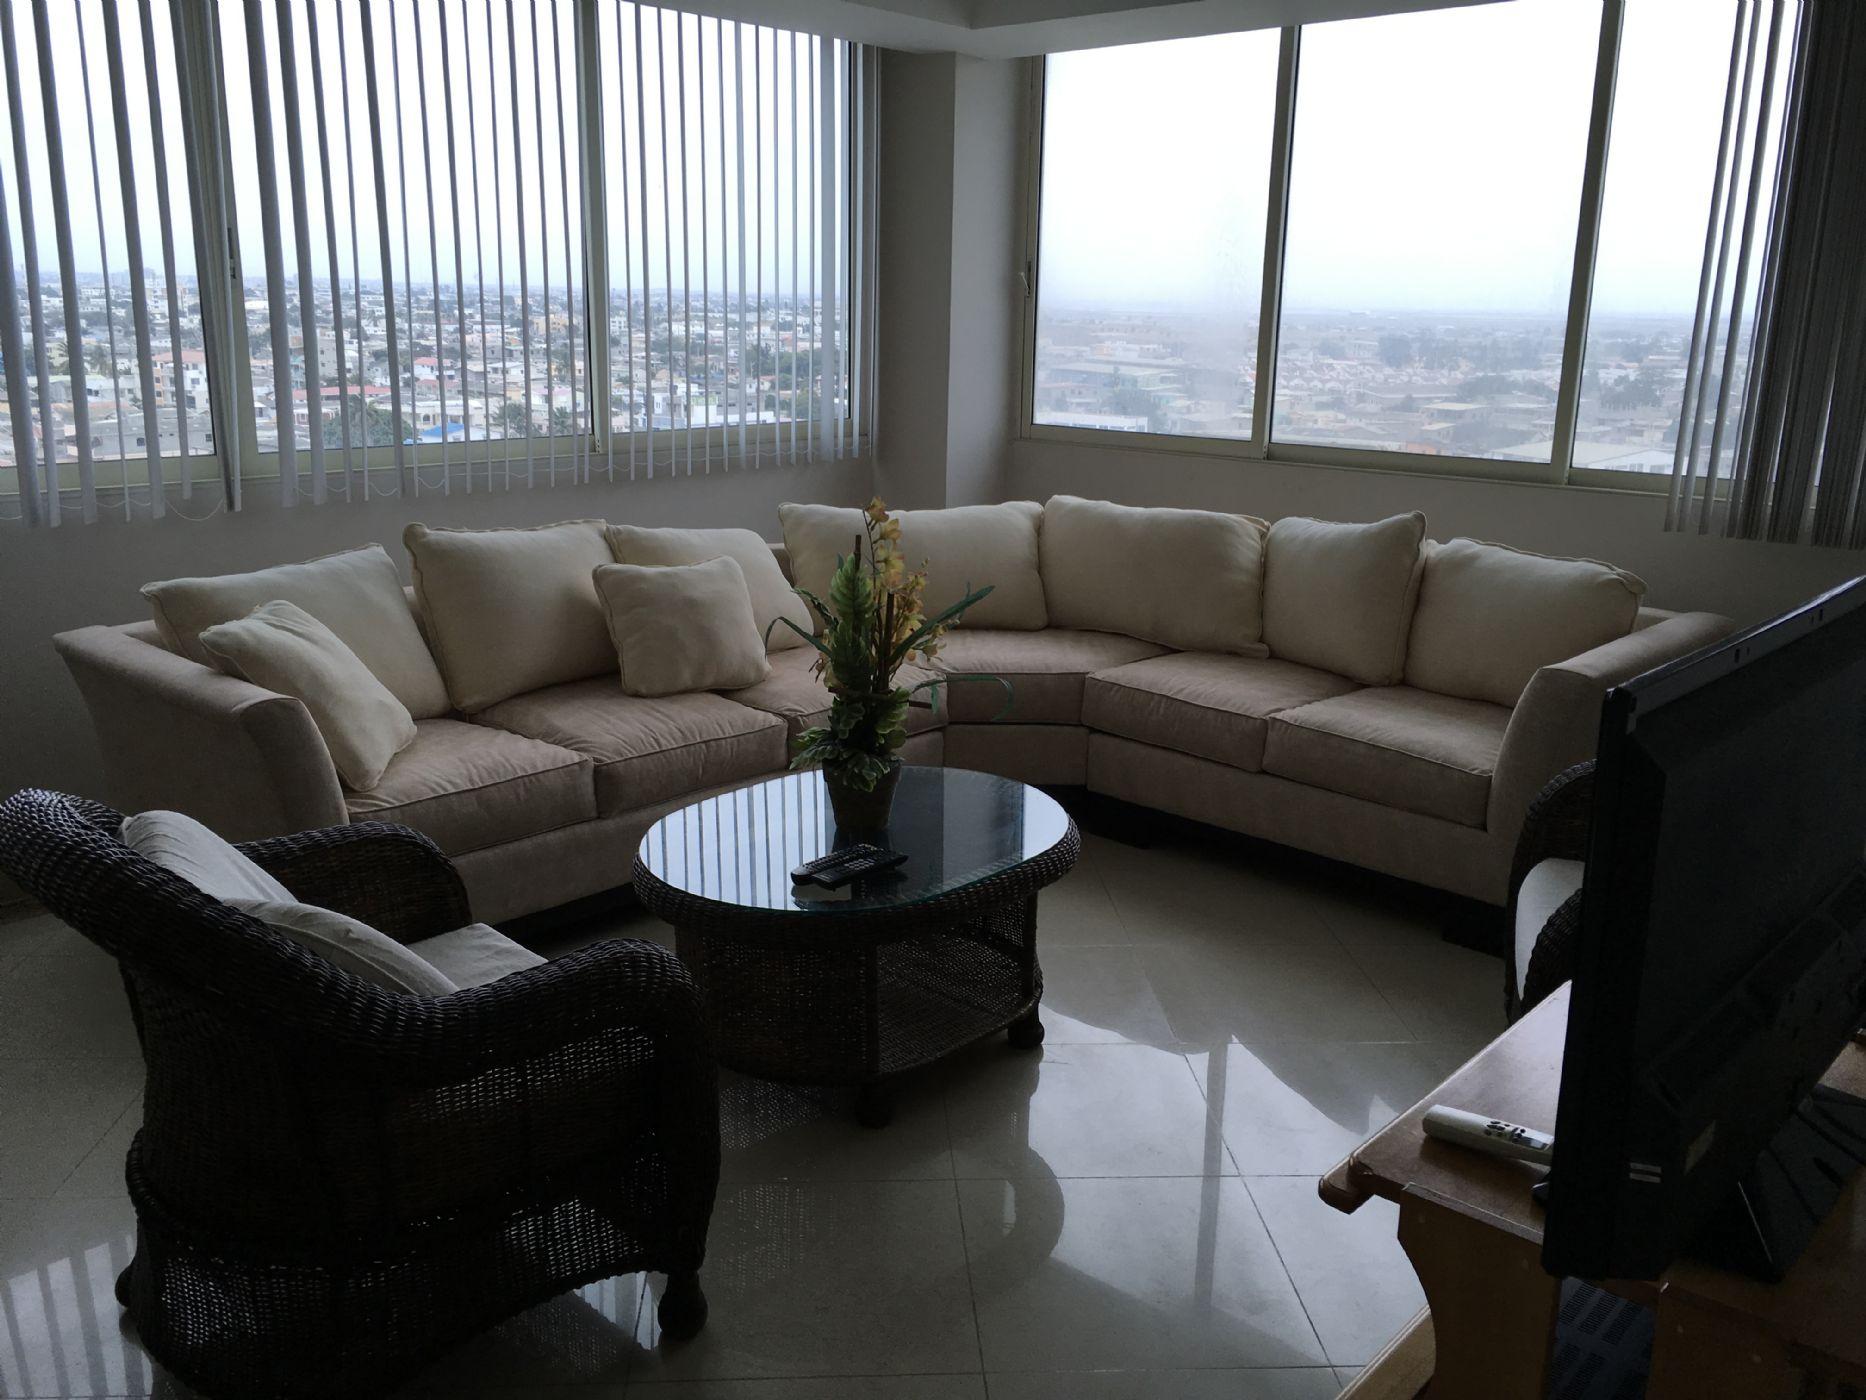 Salinas-Ecuador-property-511868-1.JPG